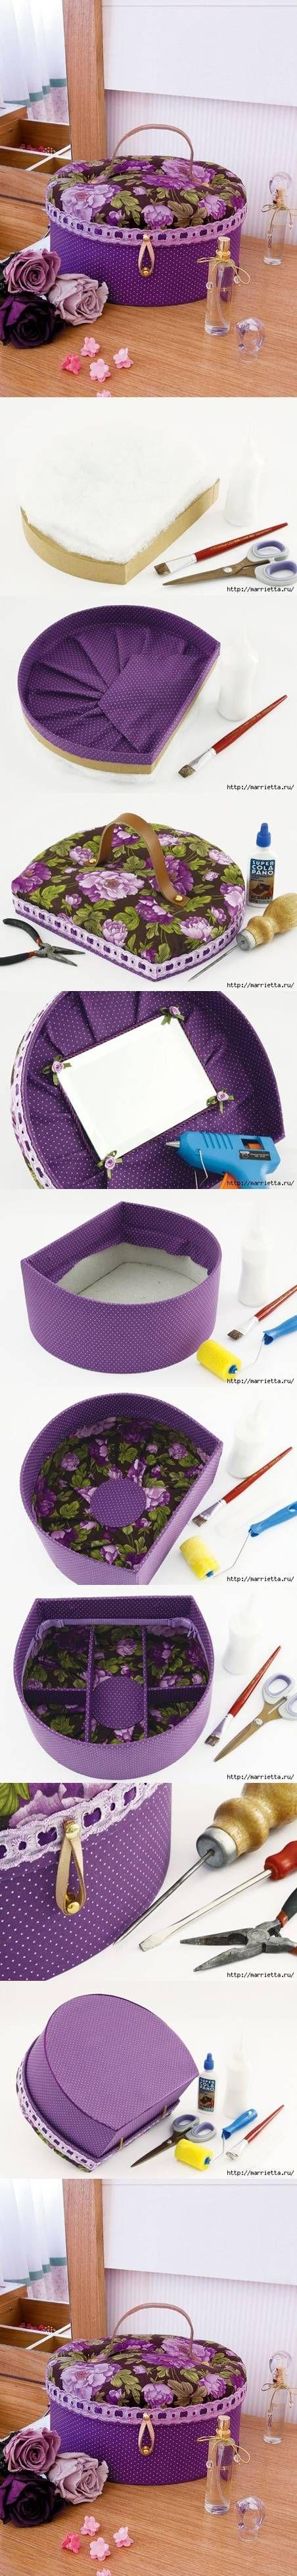 DIY Cute Makeup Box   Projects to Try   Pinterest   Schachteln ...